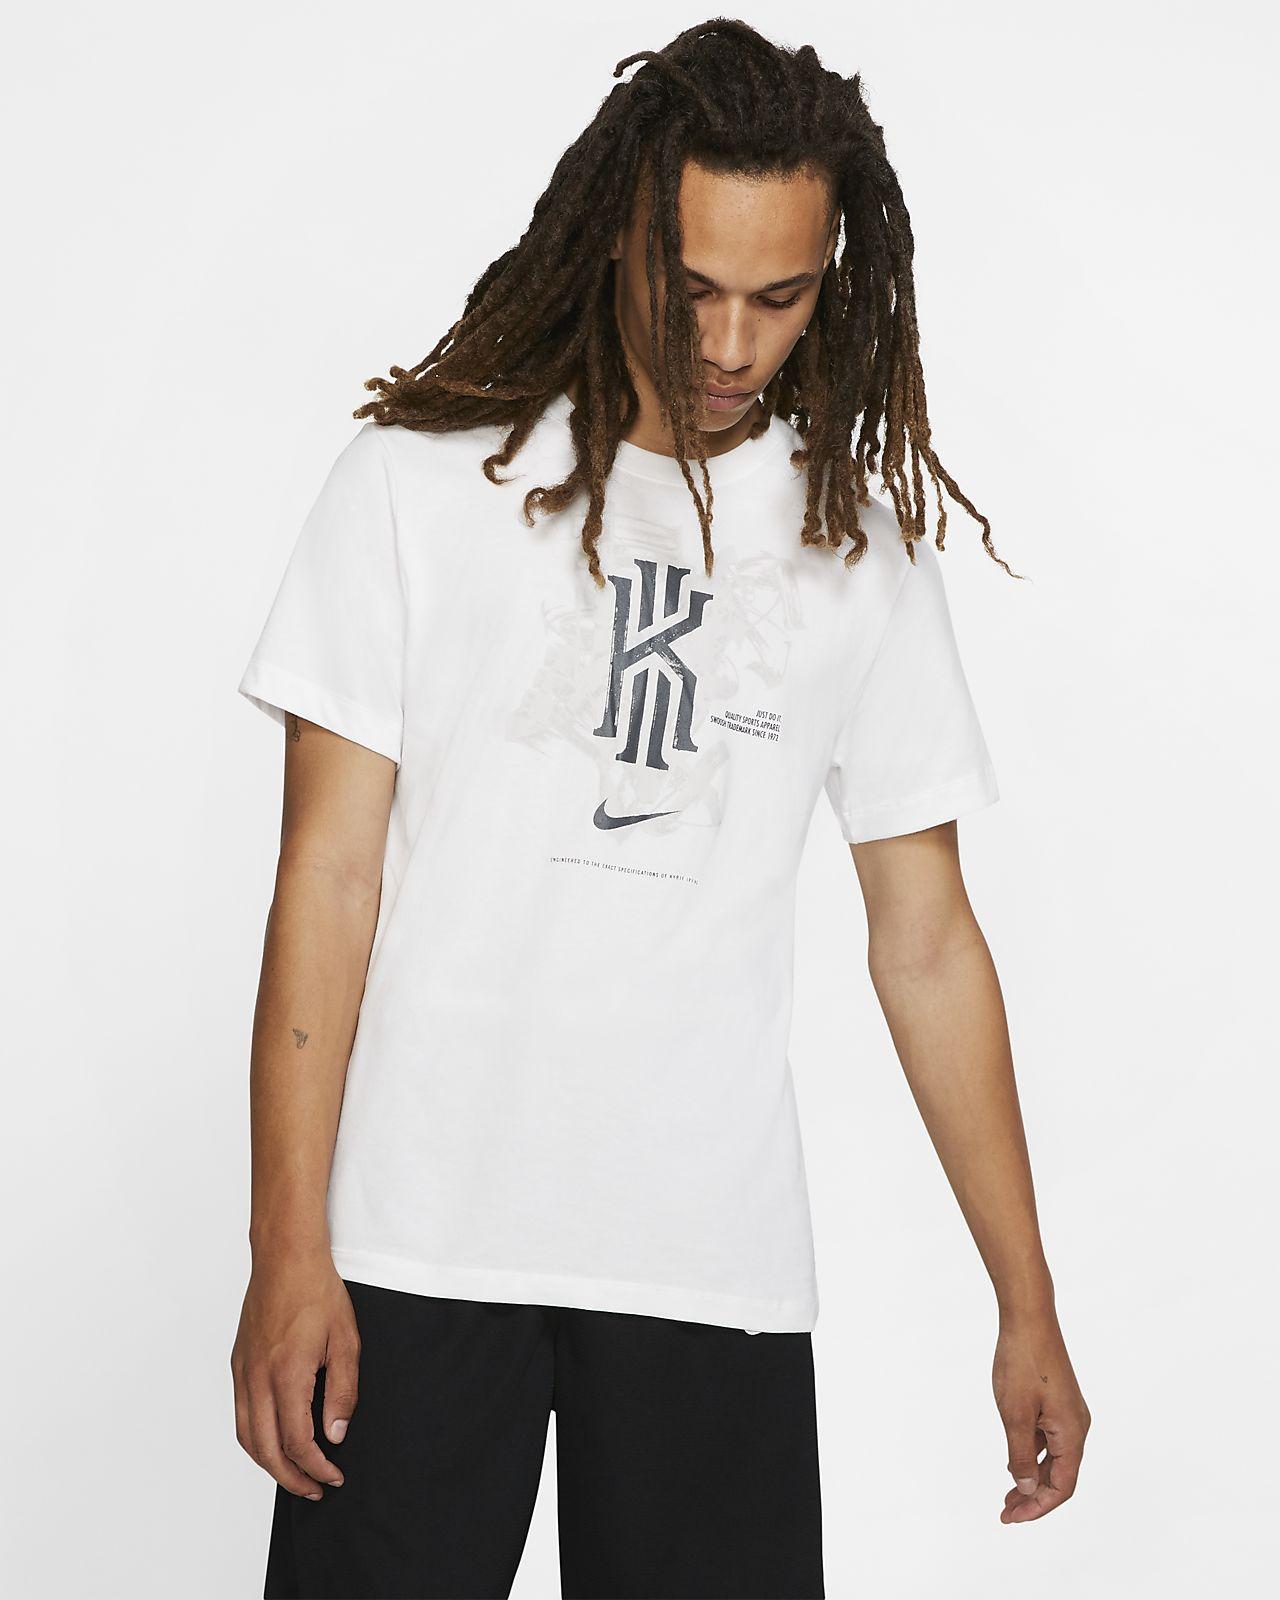 05e334edd Nike Dri-FIT Kyrie Men's Basketball T-Shirt. Nike.com LU